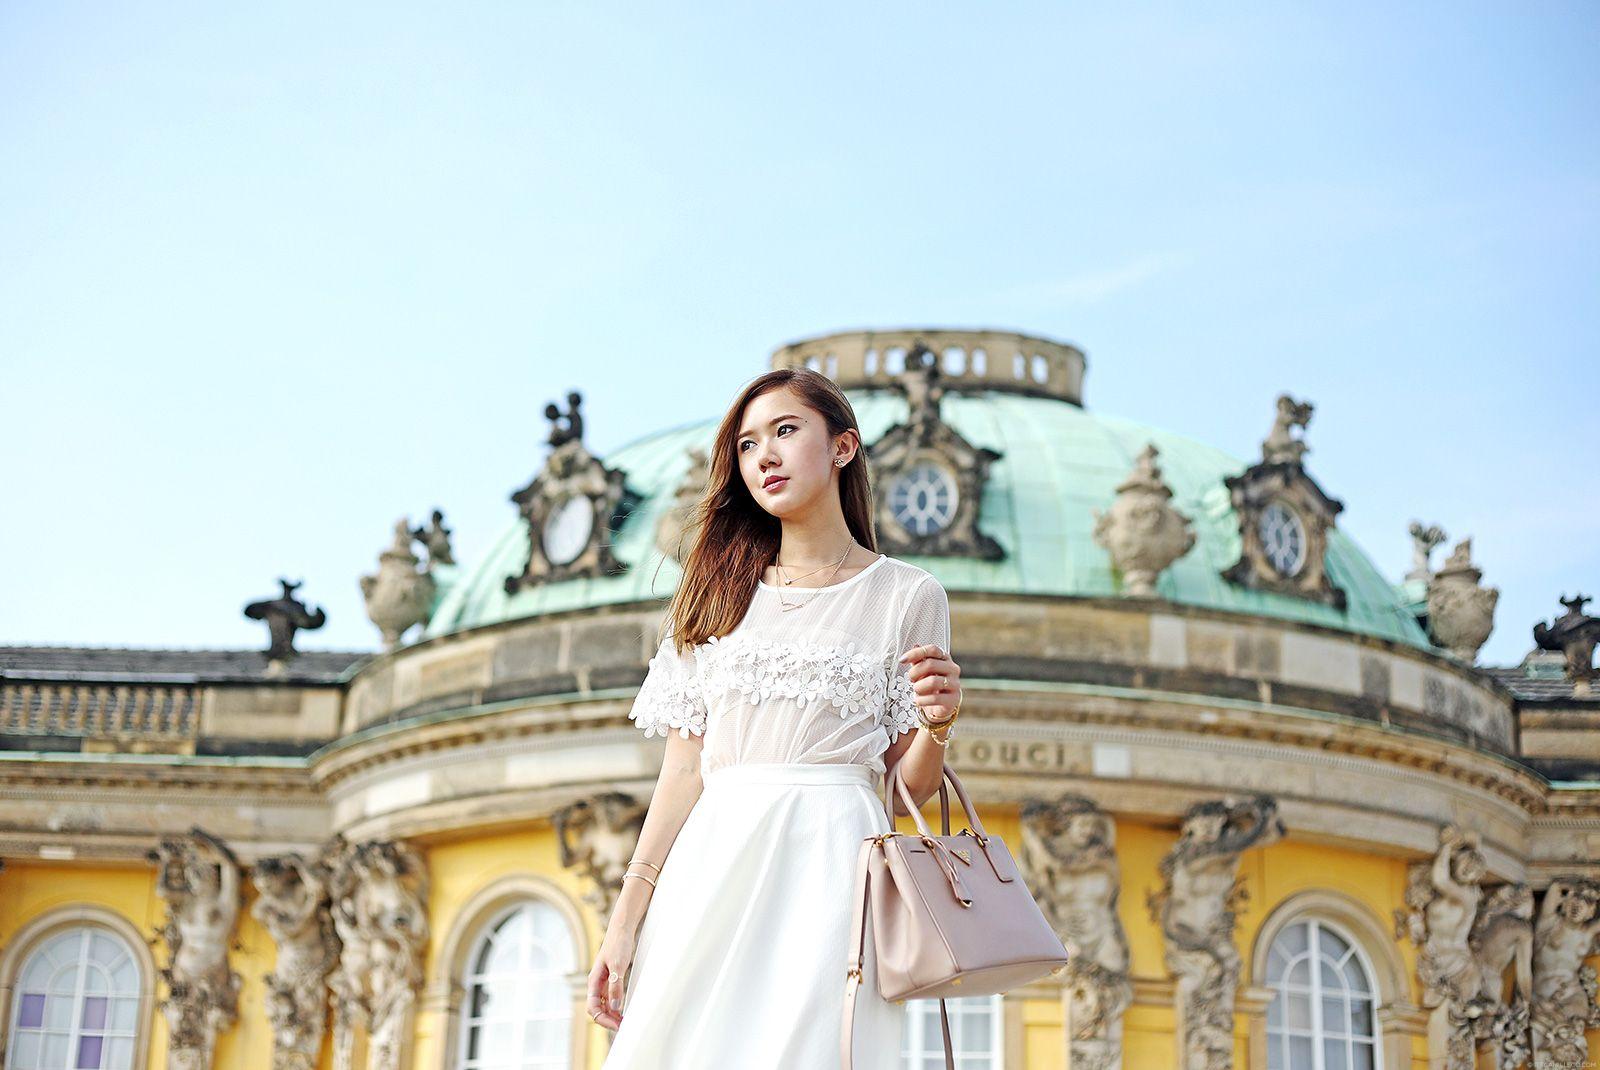 Style Blogger Camille Co at Schloss Sanssouci, Potsdam | itscamilleco.com